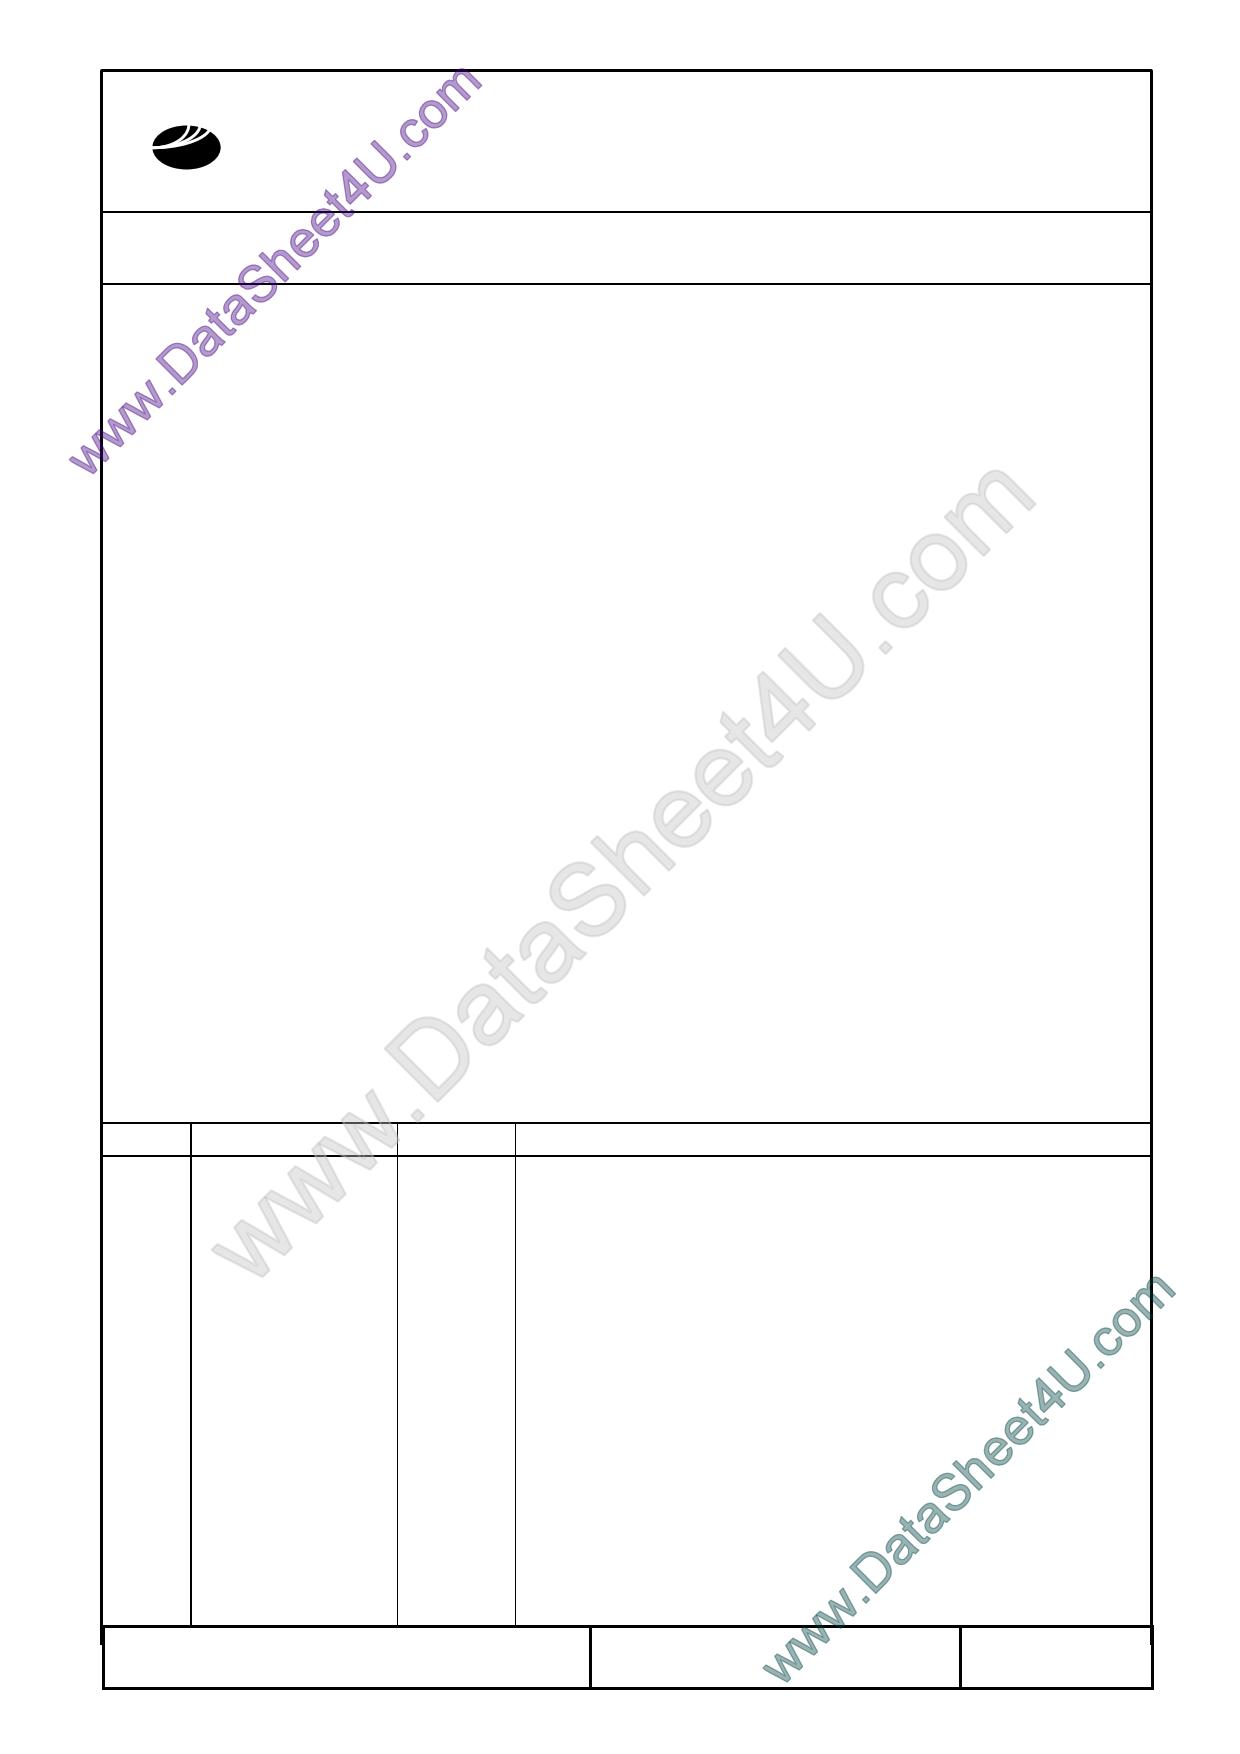 T-51383L070J_FW_P_AA datasheet